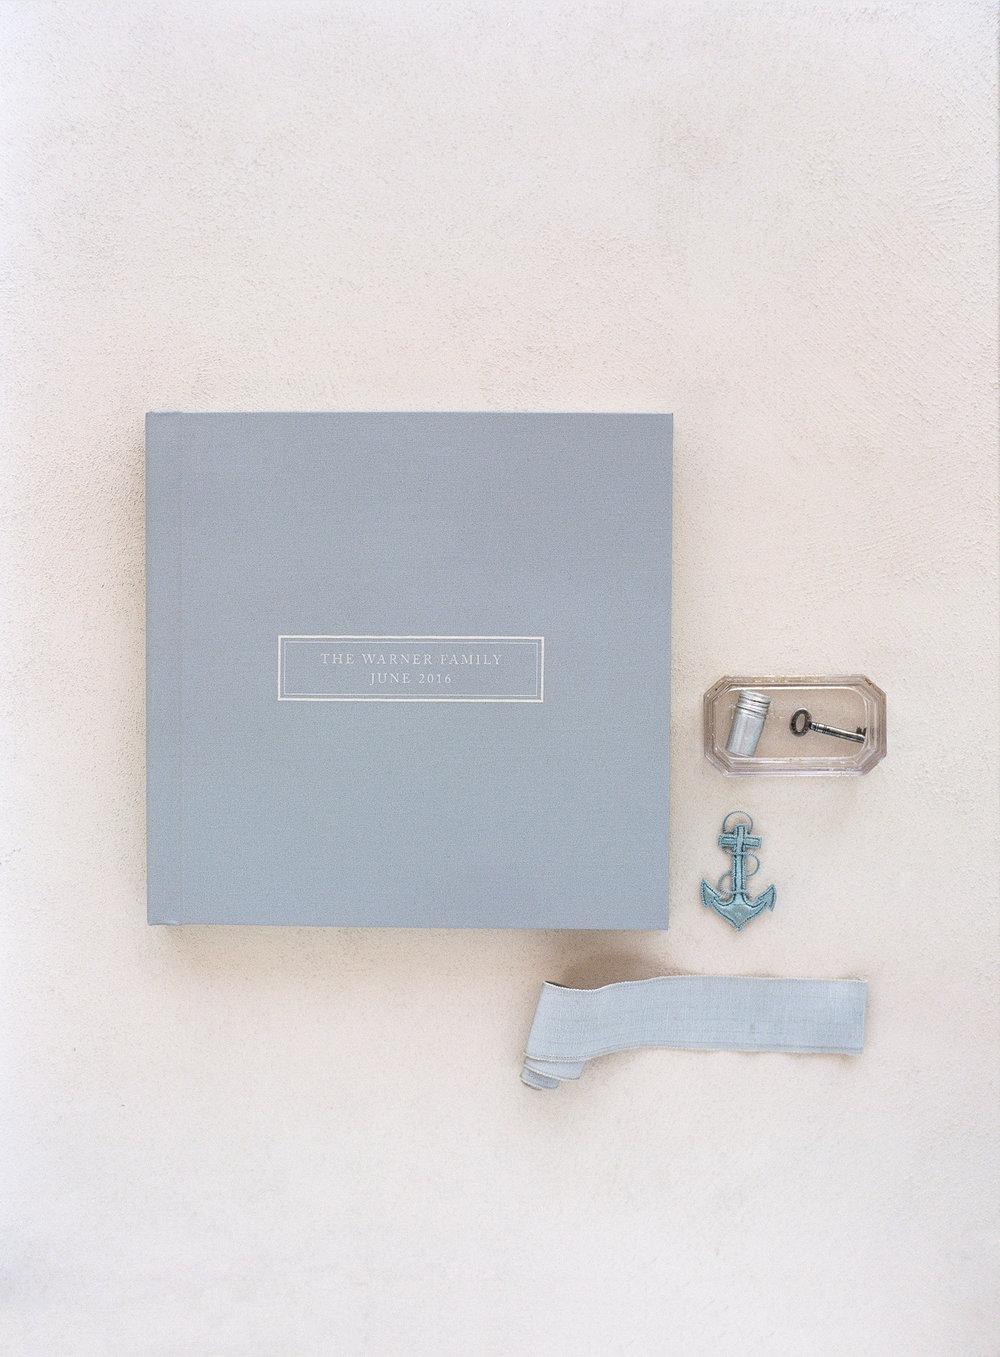 atkins-sample-album-images-3.jpg